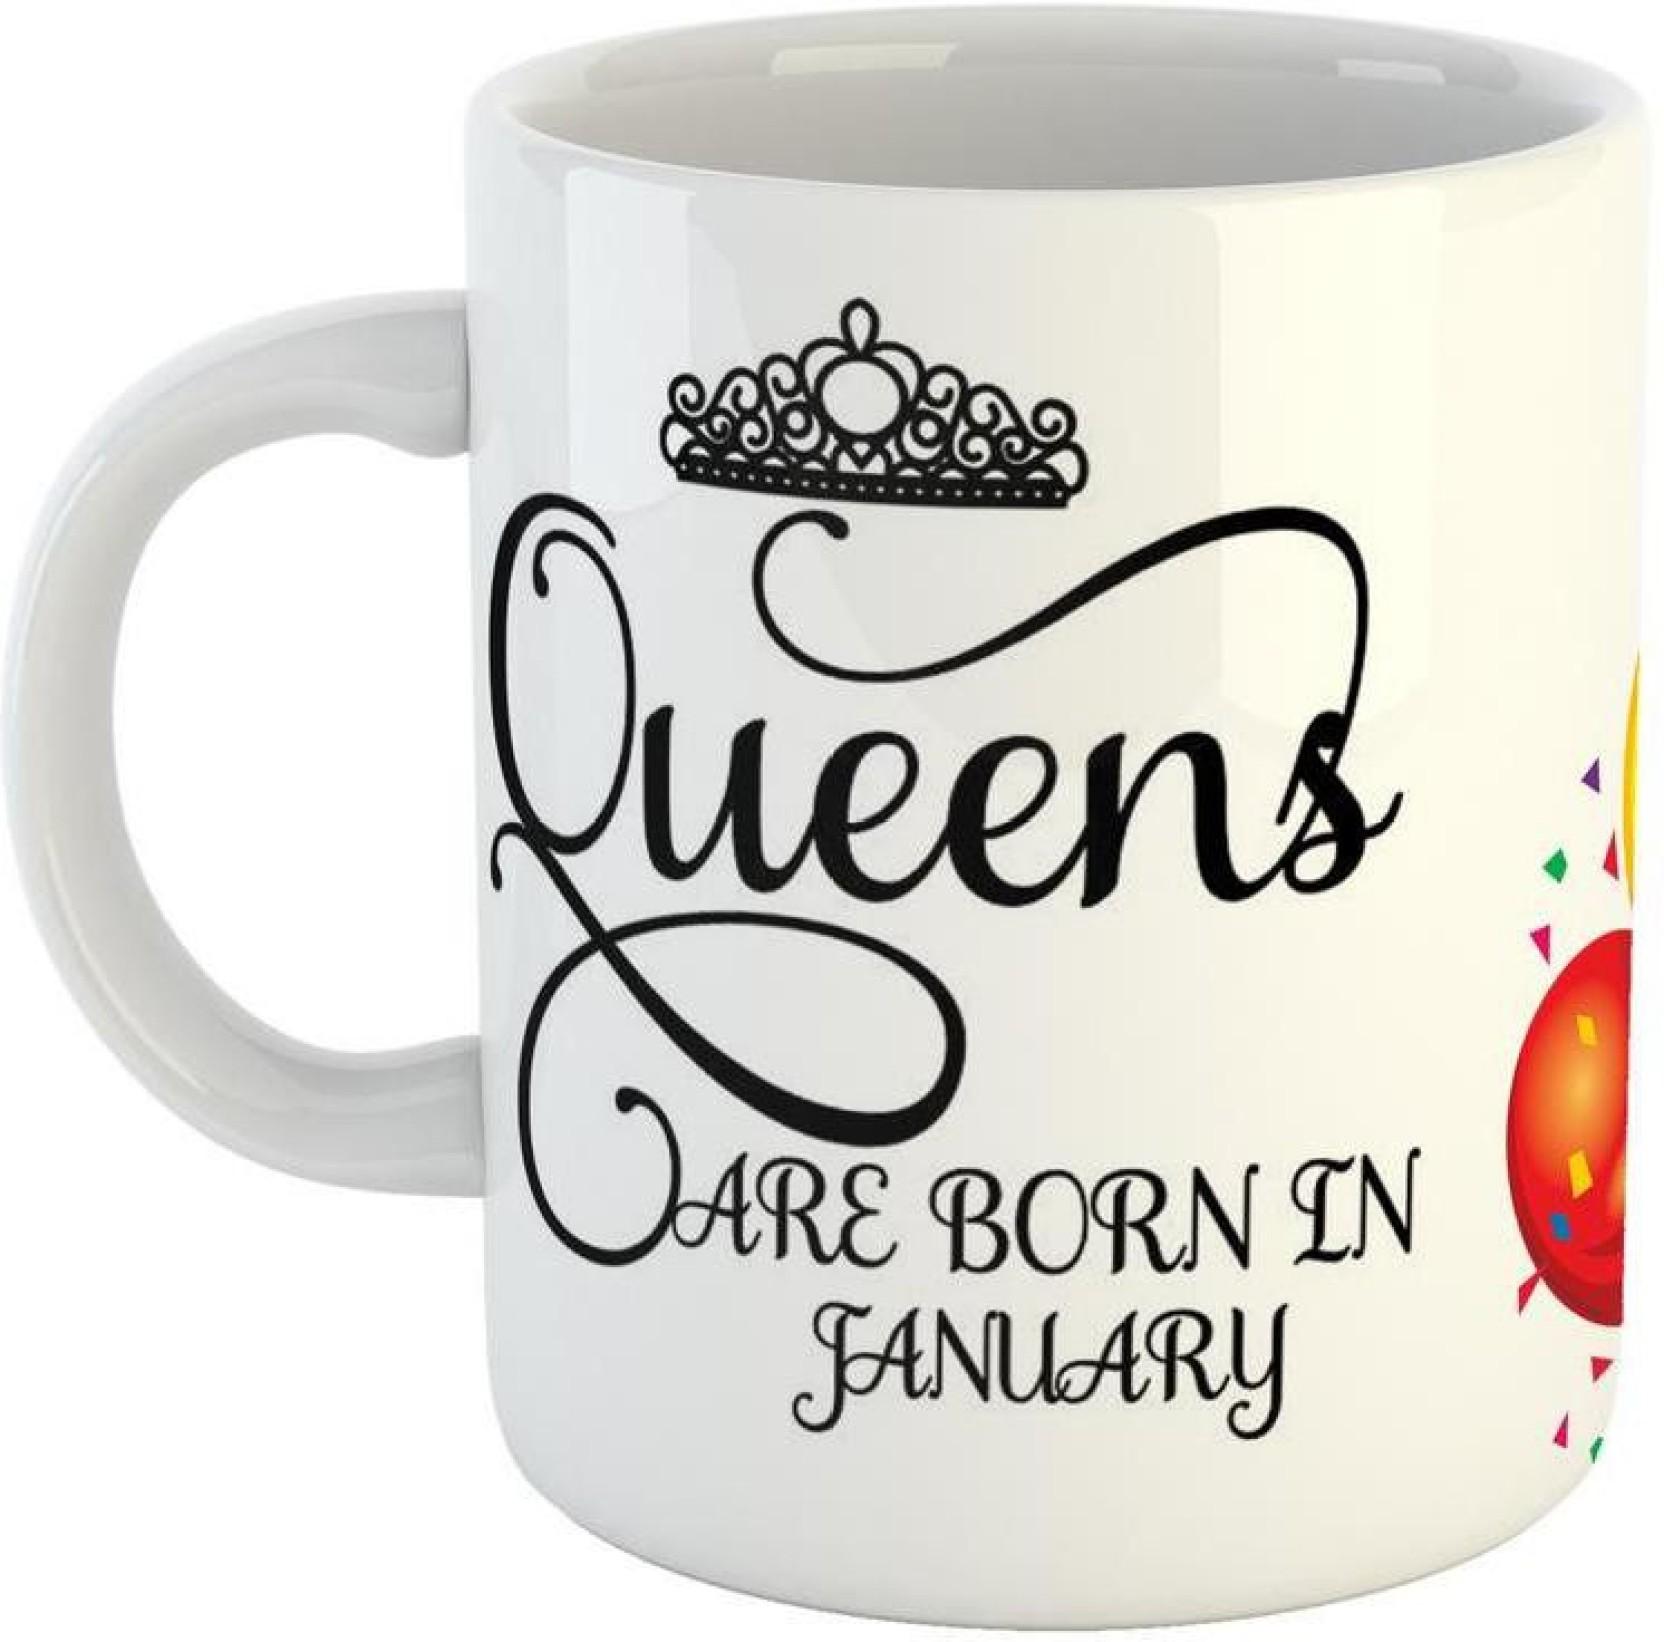 GiftOwl Best Birthday Gifts Perfect Girls Born In January Ceramic Coffee For Friend Girlfriend BoyFriend Glossy Finish With Vibrant Print Mug